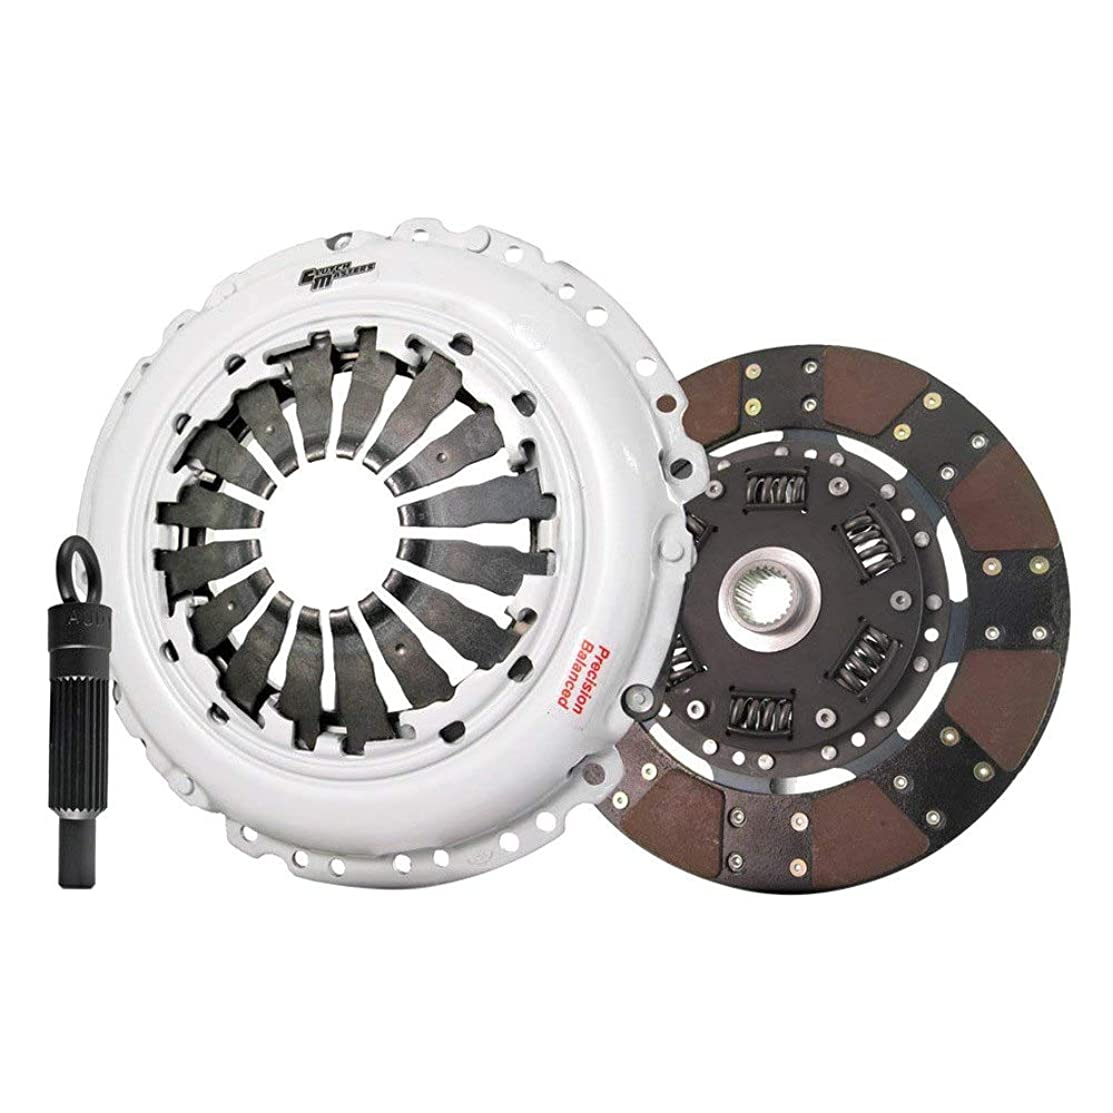 Clutch Masters 05500-HD0F-D Single Disc Clutch Kit with Heavy Duty Pressure Plate (Fiat 500 2012-2014 .)